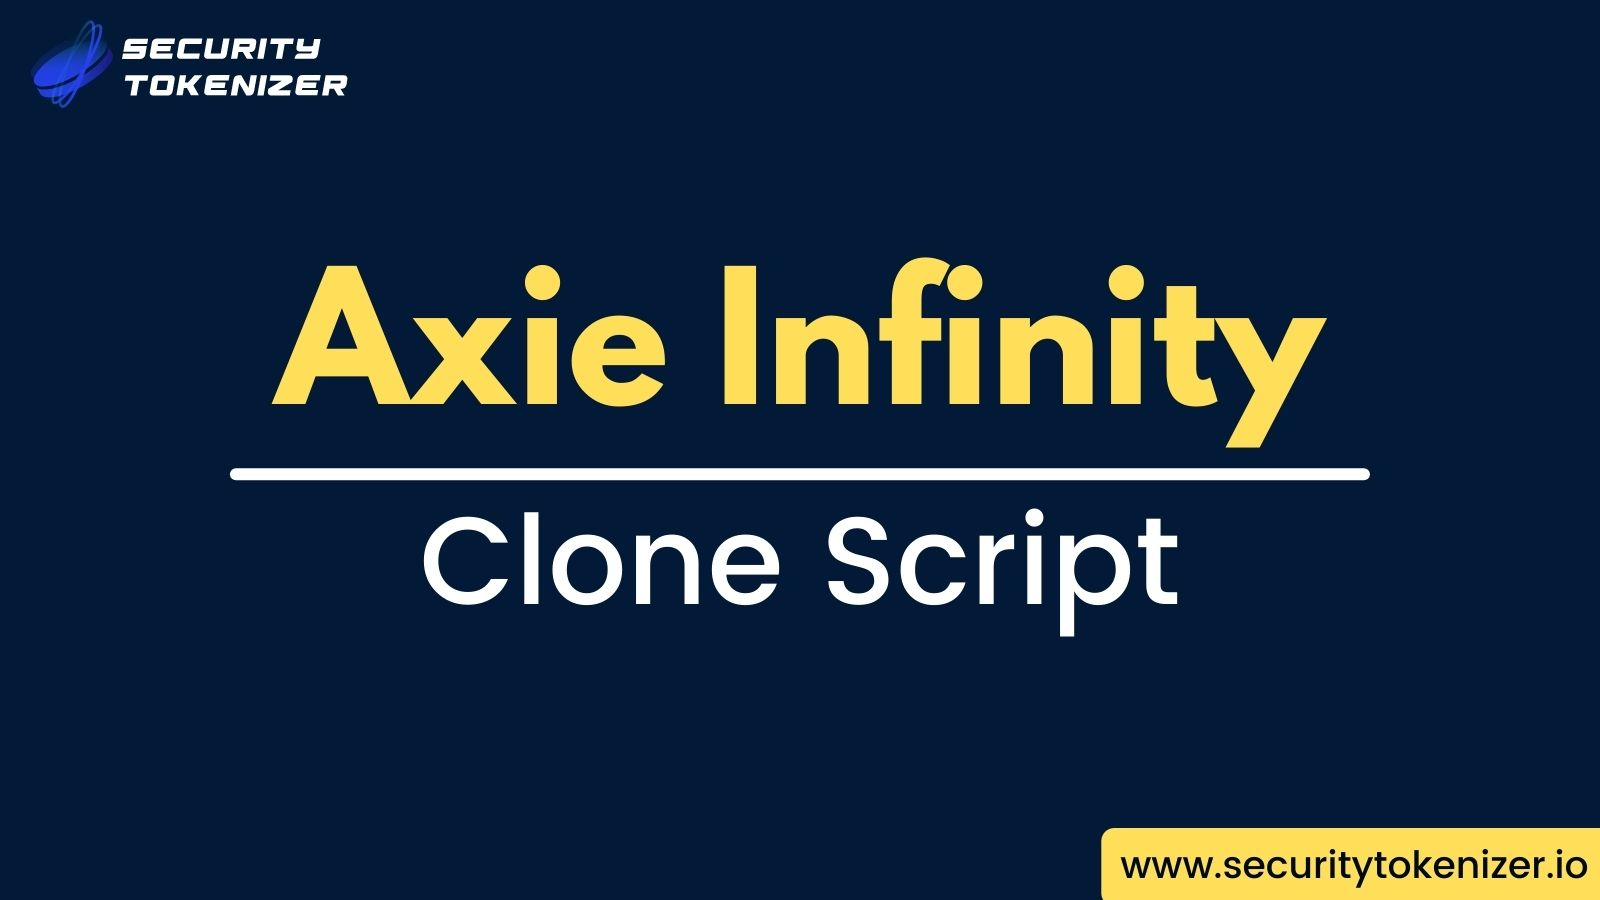 Axie Infinity Clone Script To Create an NFT Gaming Platform Like Axie Infinity